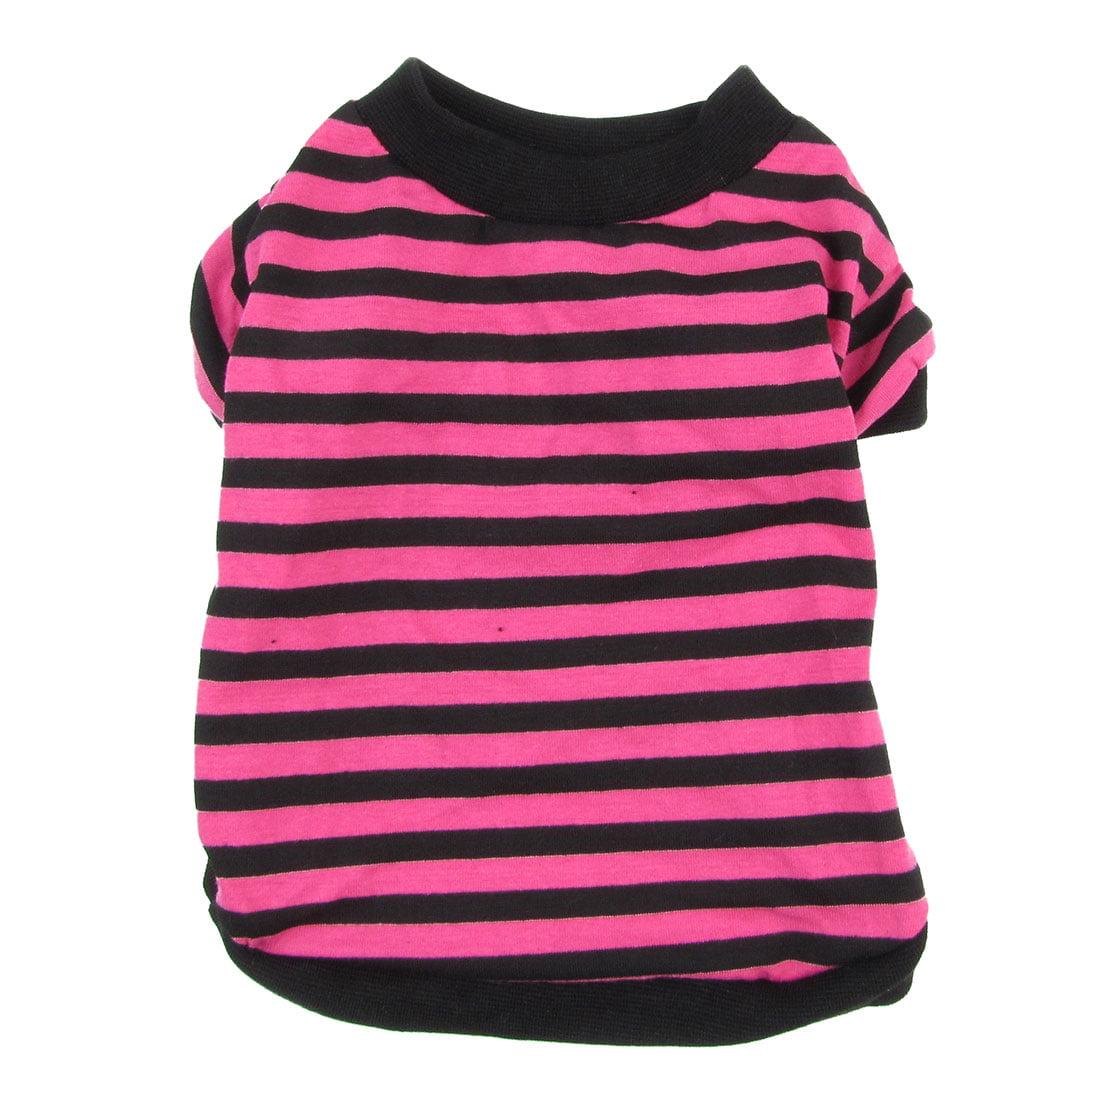 Striped Printed Doggy Pet Clothing Dog Tank Top Summer Shirt Fuchsia Black S